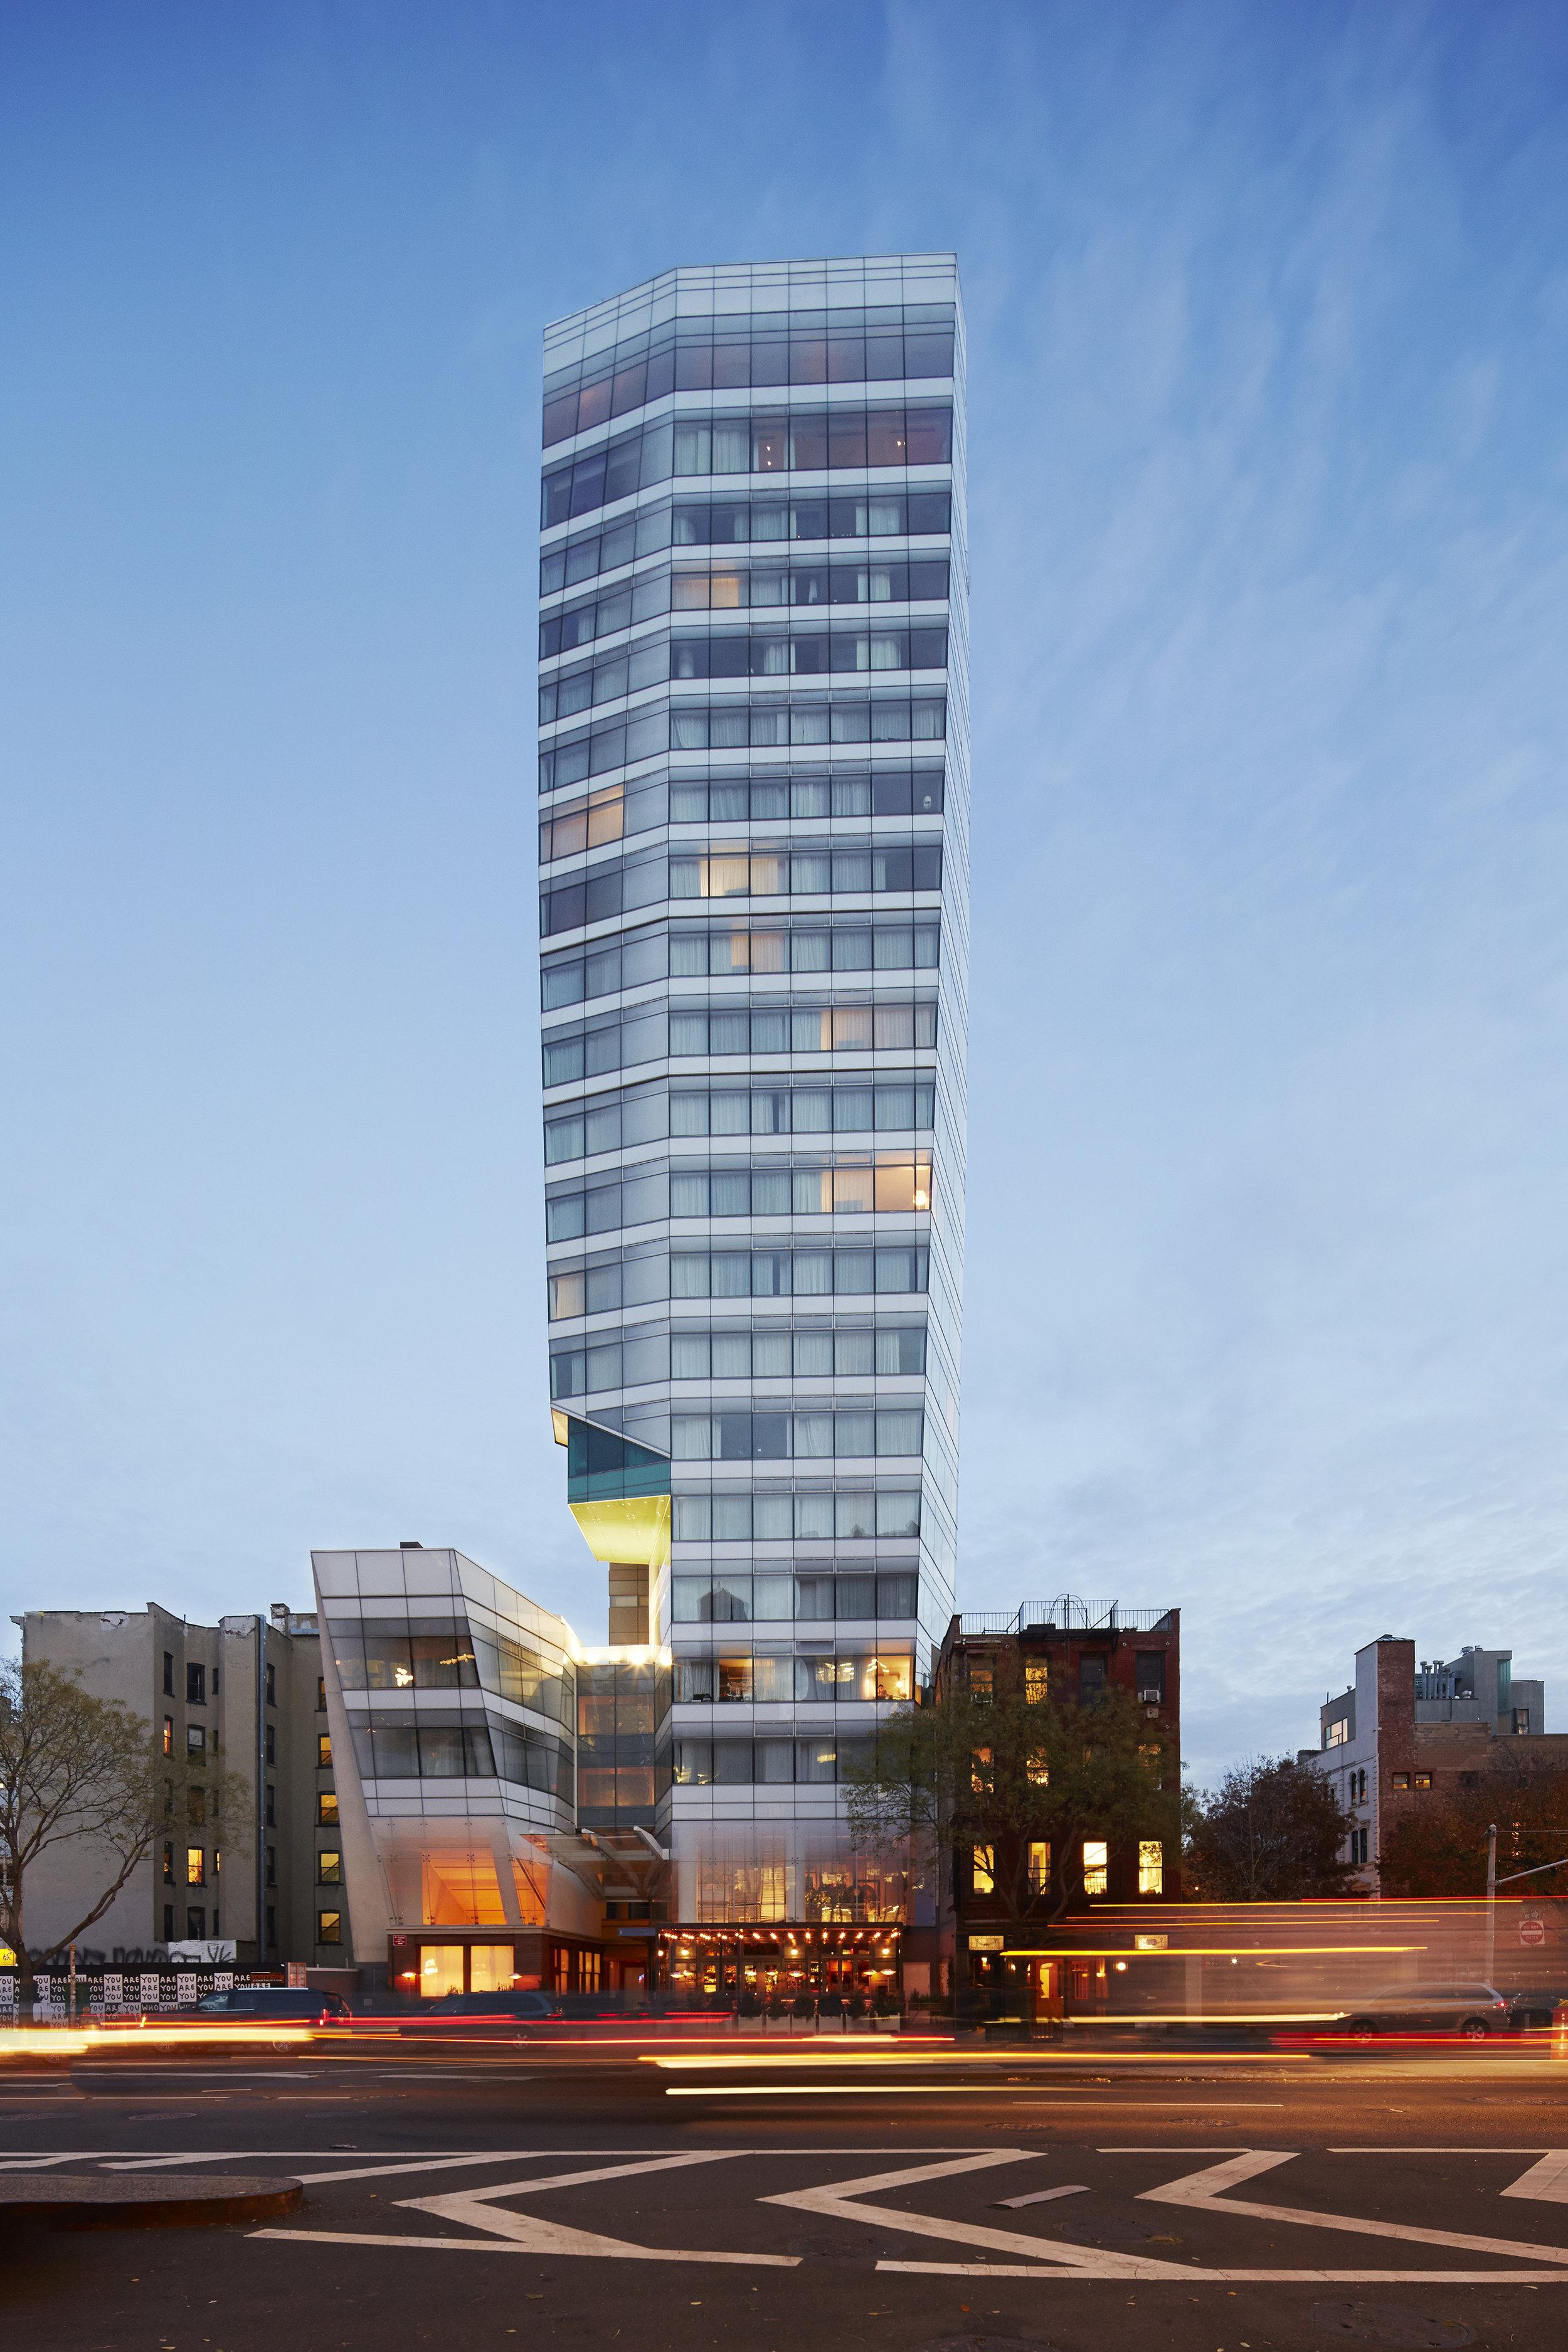 STEV_Exterior_Hotel_HR_ThomasLoof.jpg